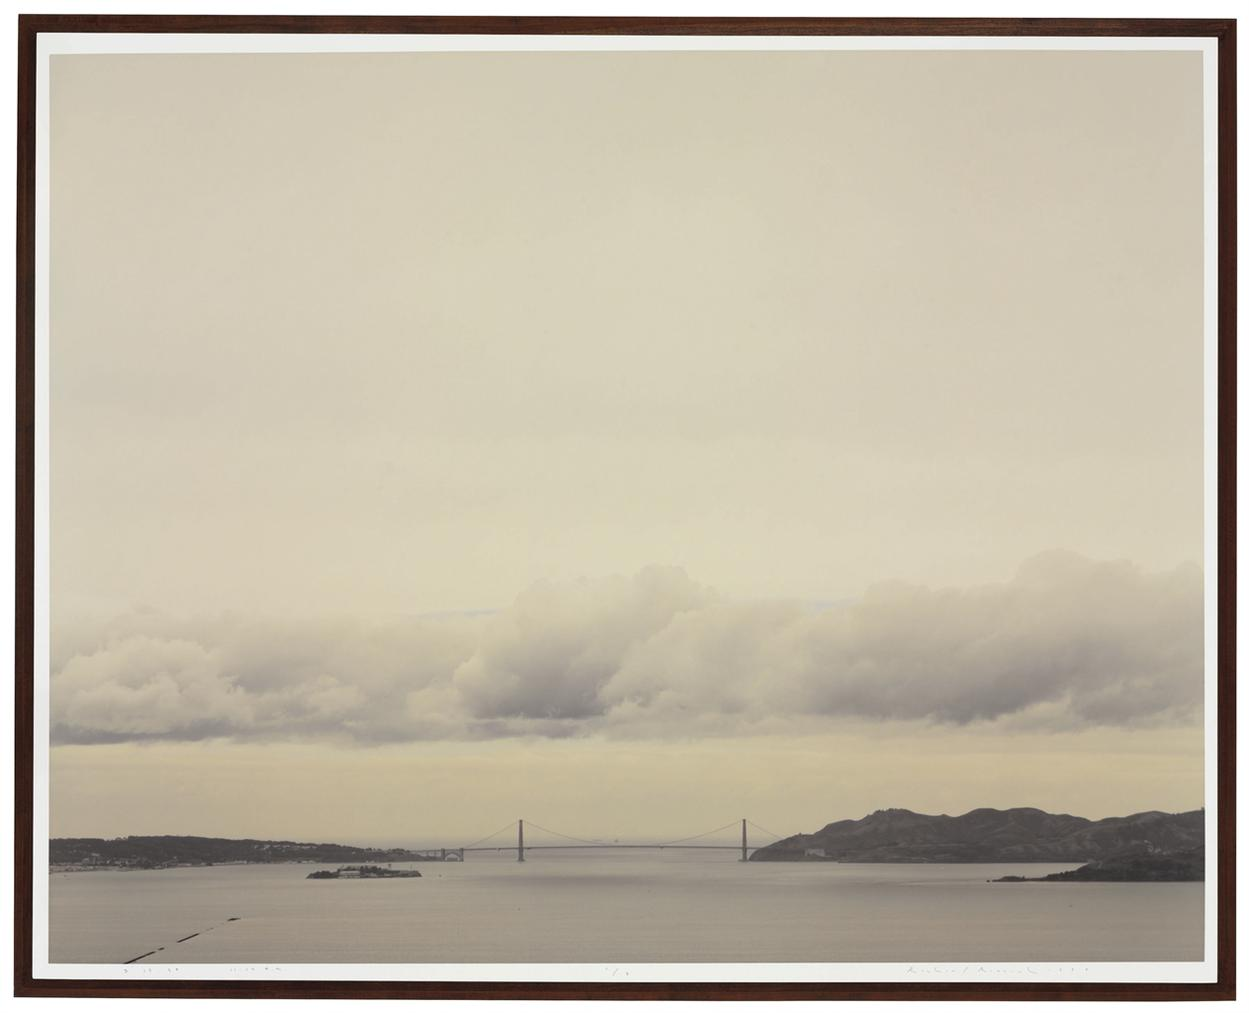 Richard Misrach-Golden Gate Bridge, 3.19.99, 11:14 A.M.-1999